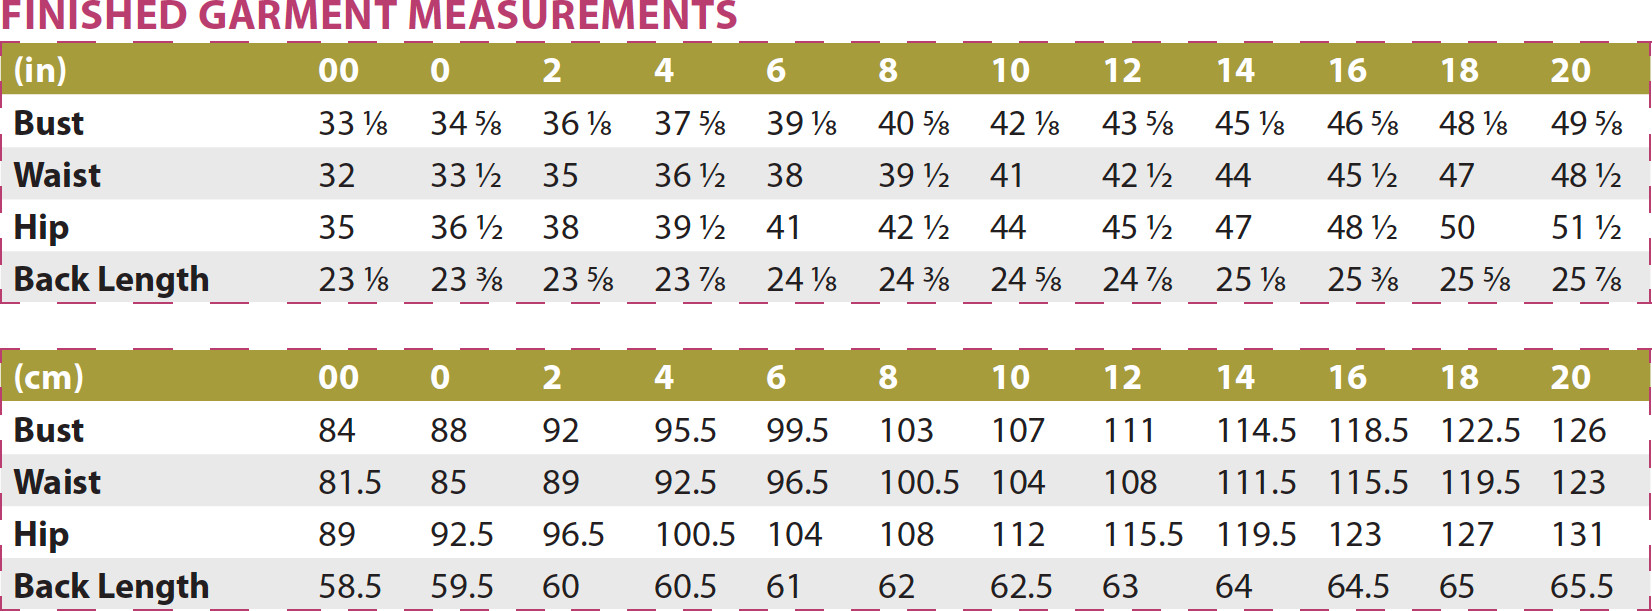 Busan Top PDF Sewing Pattern Finished Garment Measurements